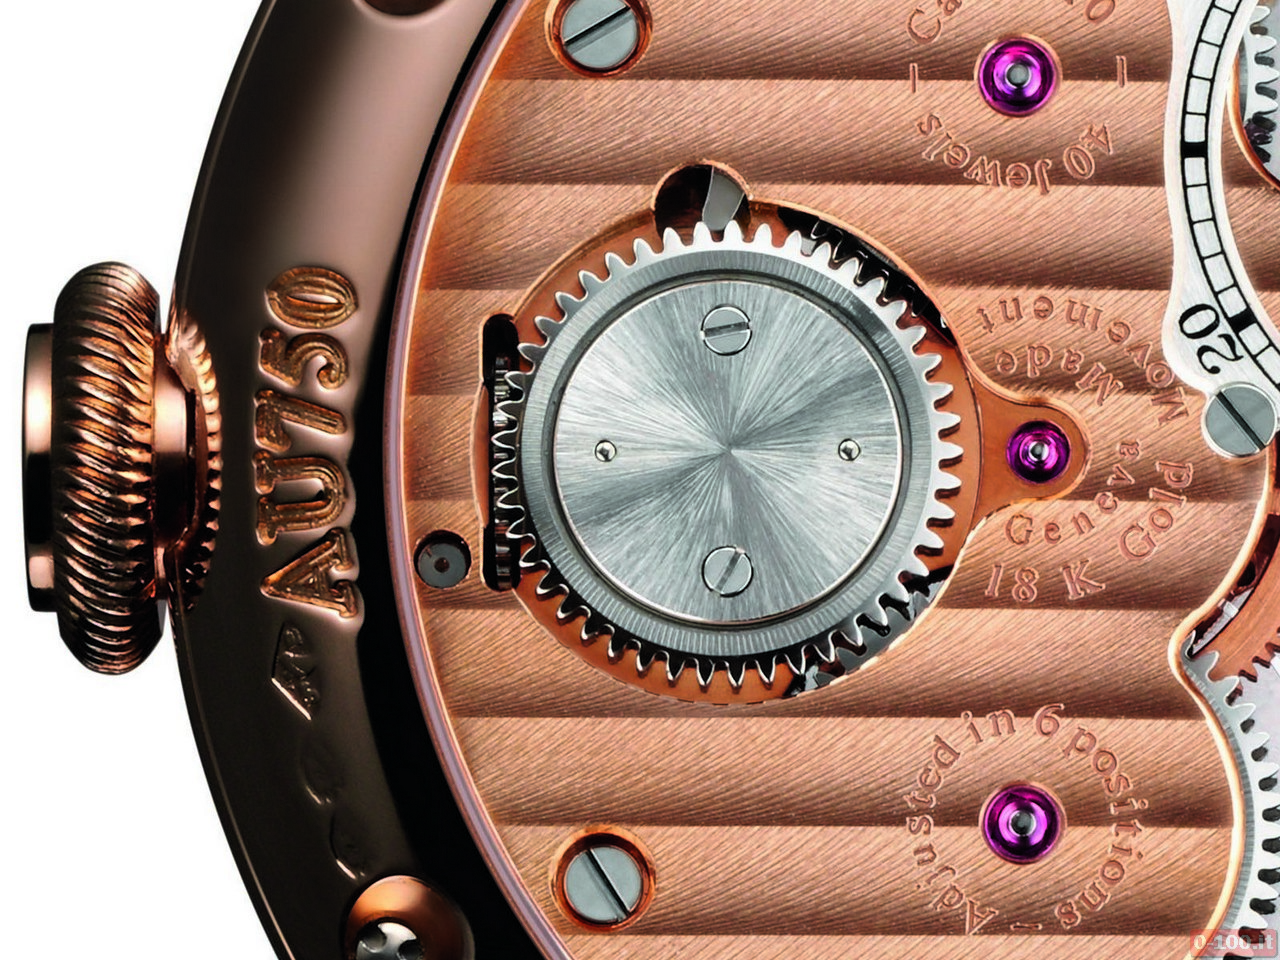 f-p-journe-chronometre-optimum-0-100_13